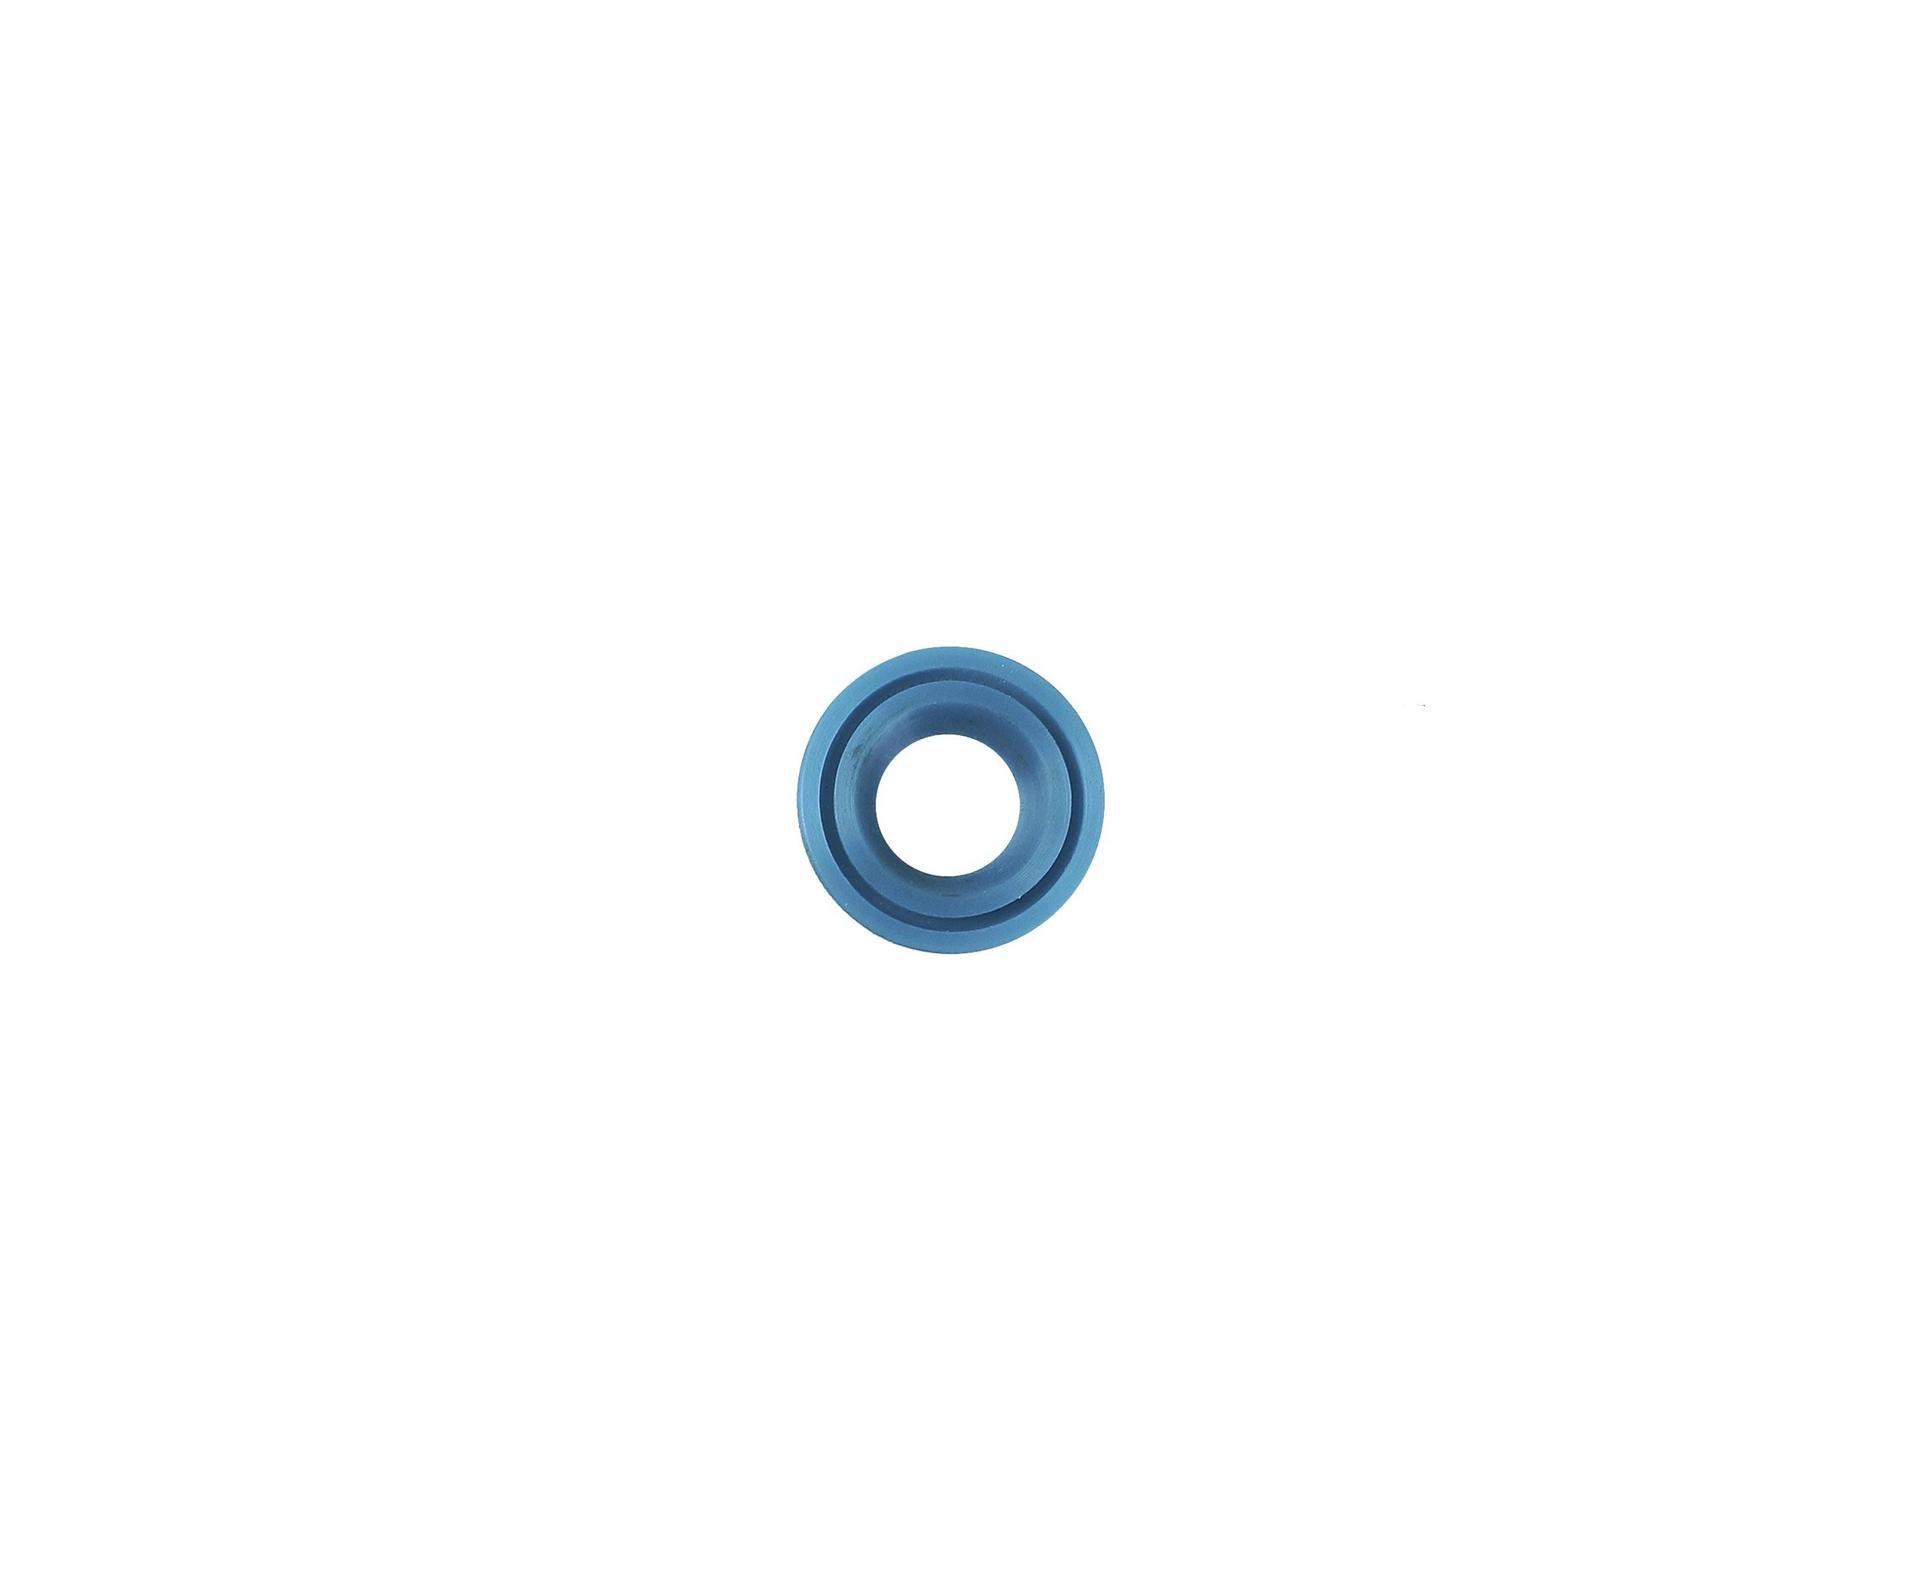 Retentor Bucha PU Carabina CBC G2, Nitro, Jade, Jade Pro, AG10 - Quickshot